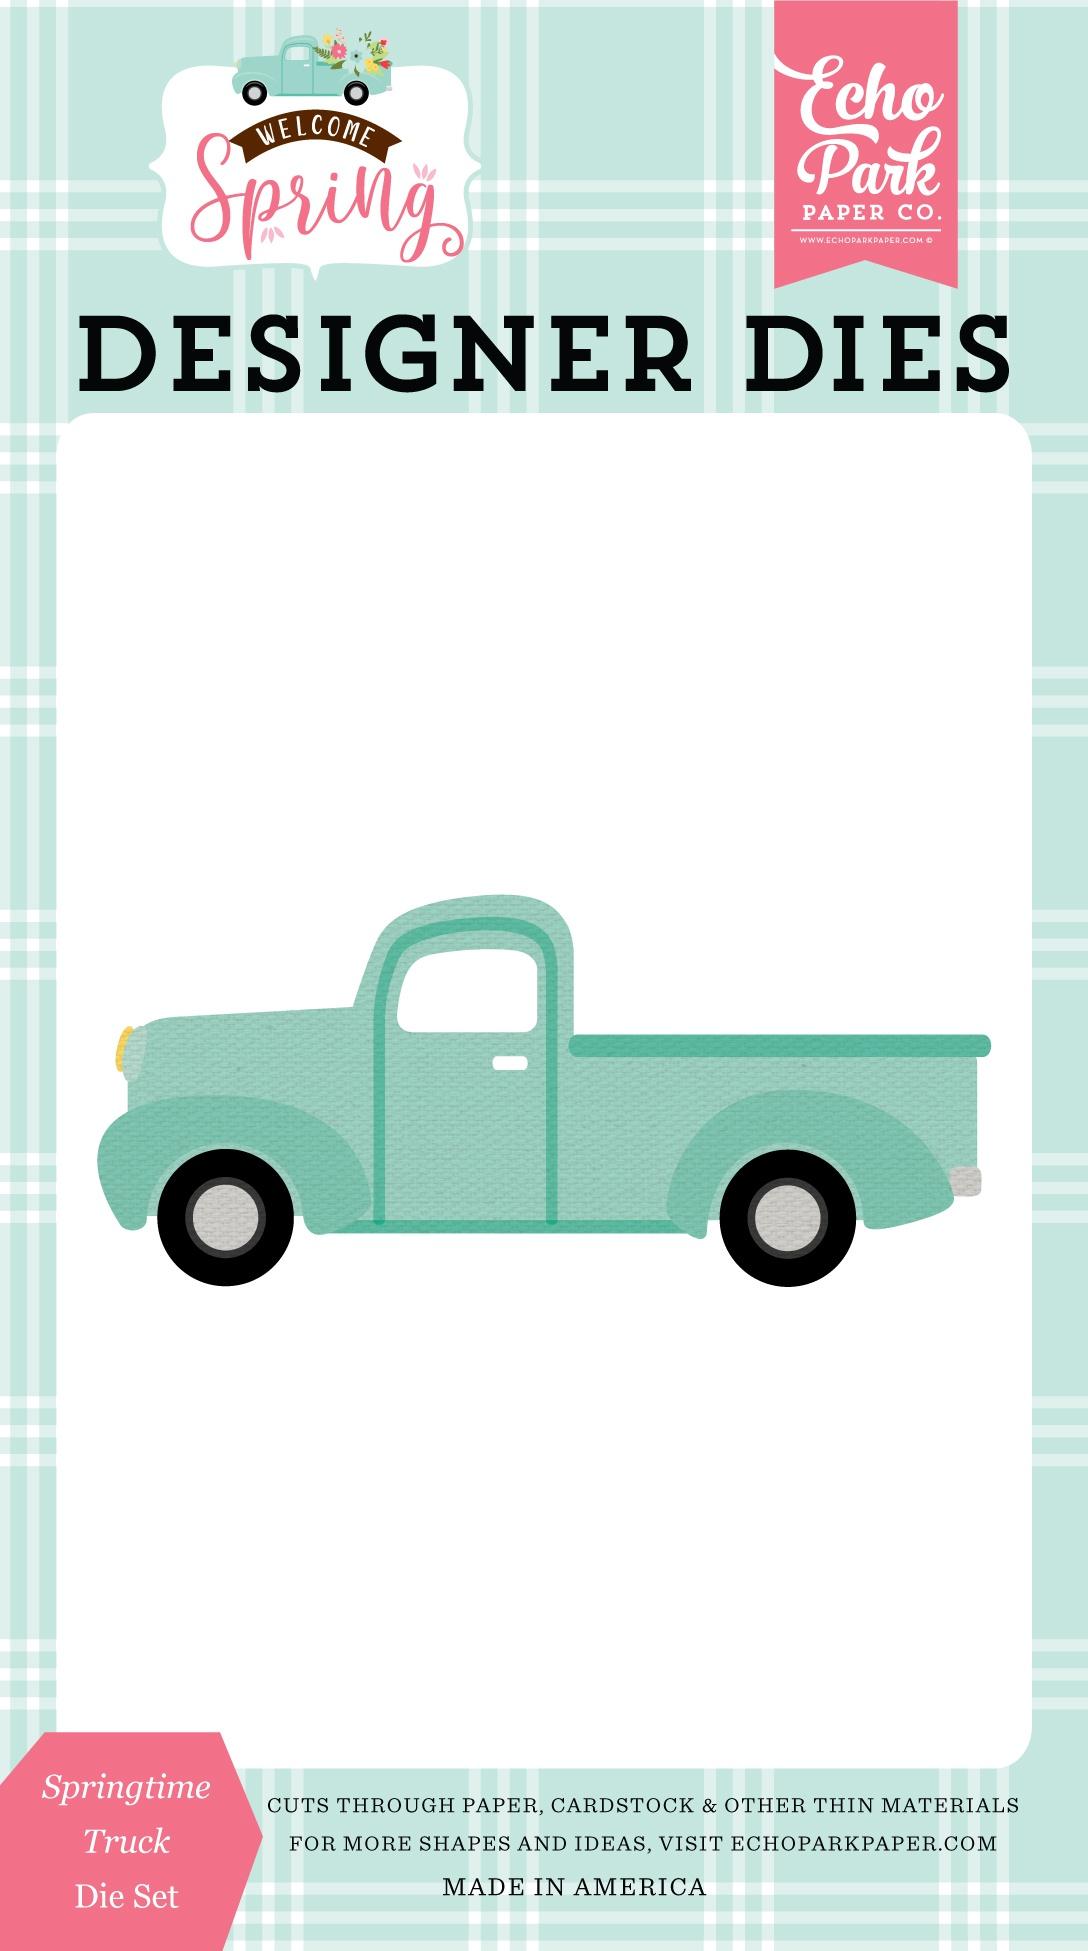 Echo Park Dies-Springtime Truck, Welcome Spring